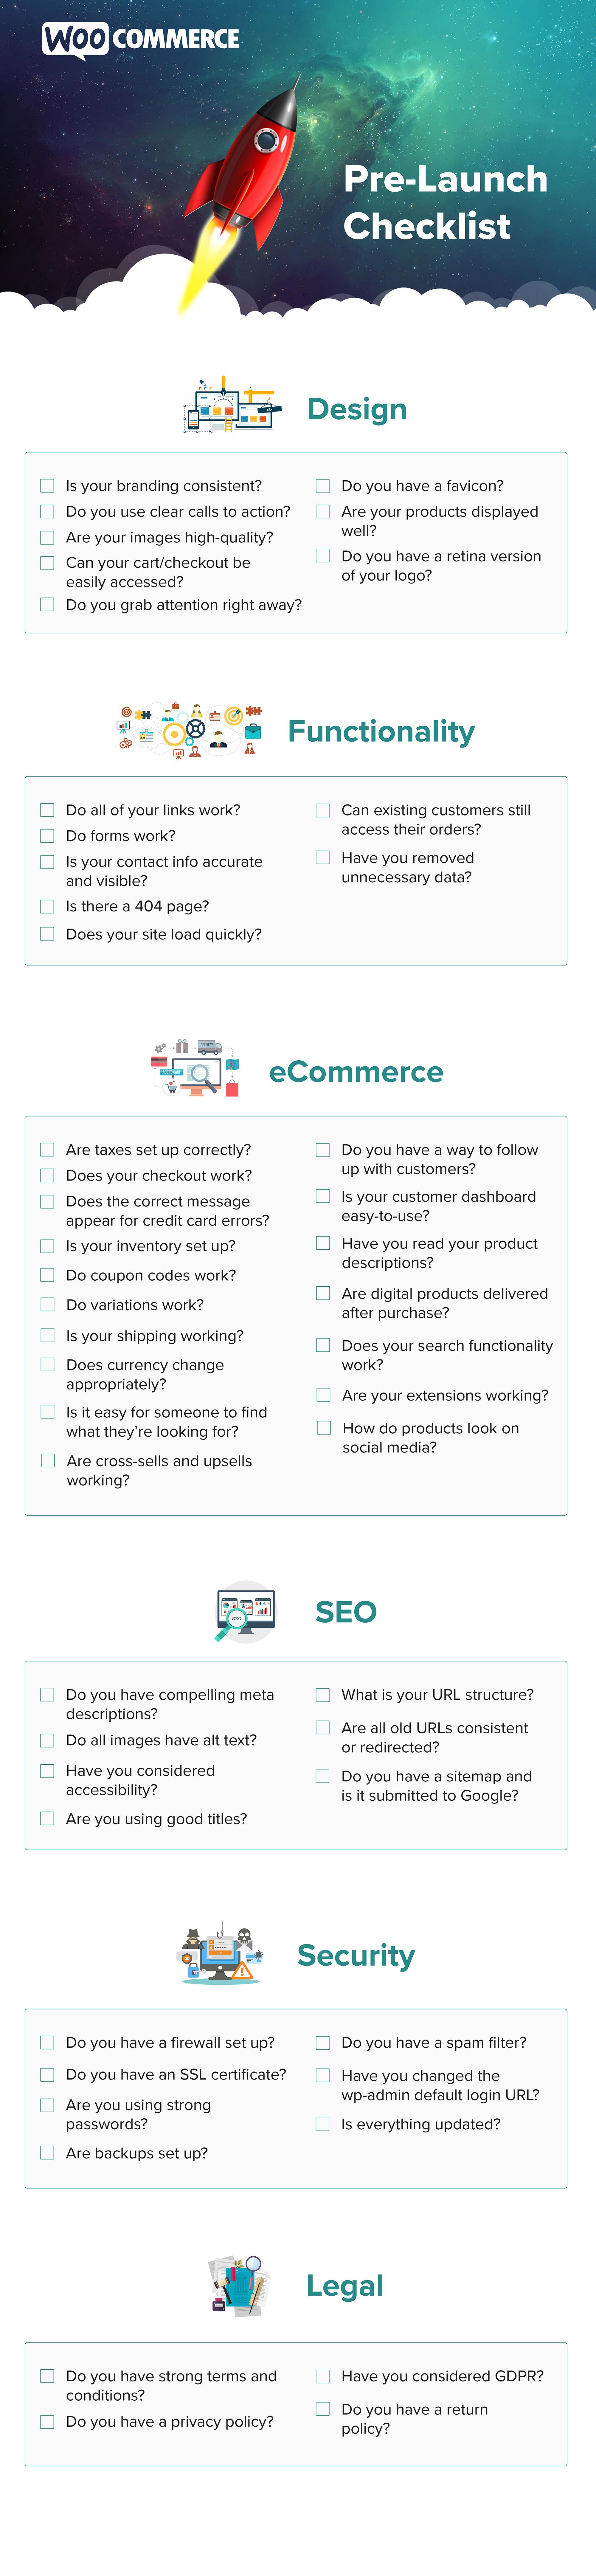 eCommerce Website Launch Checklist – The Essentials